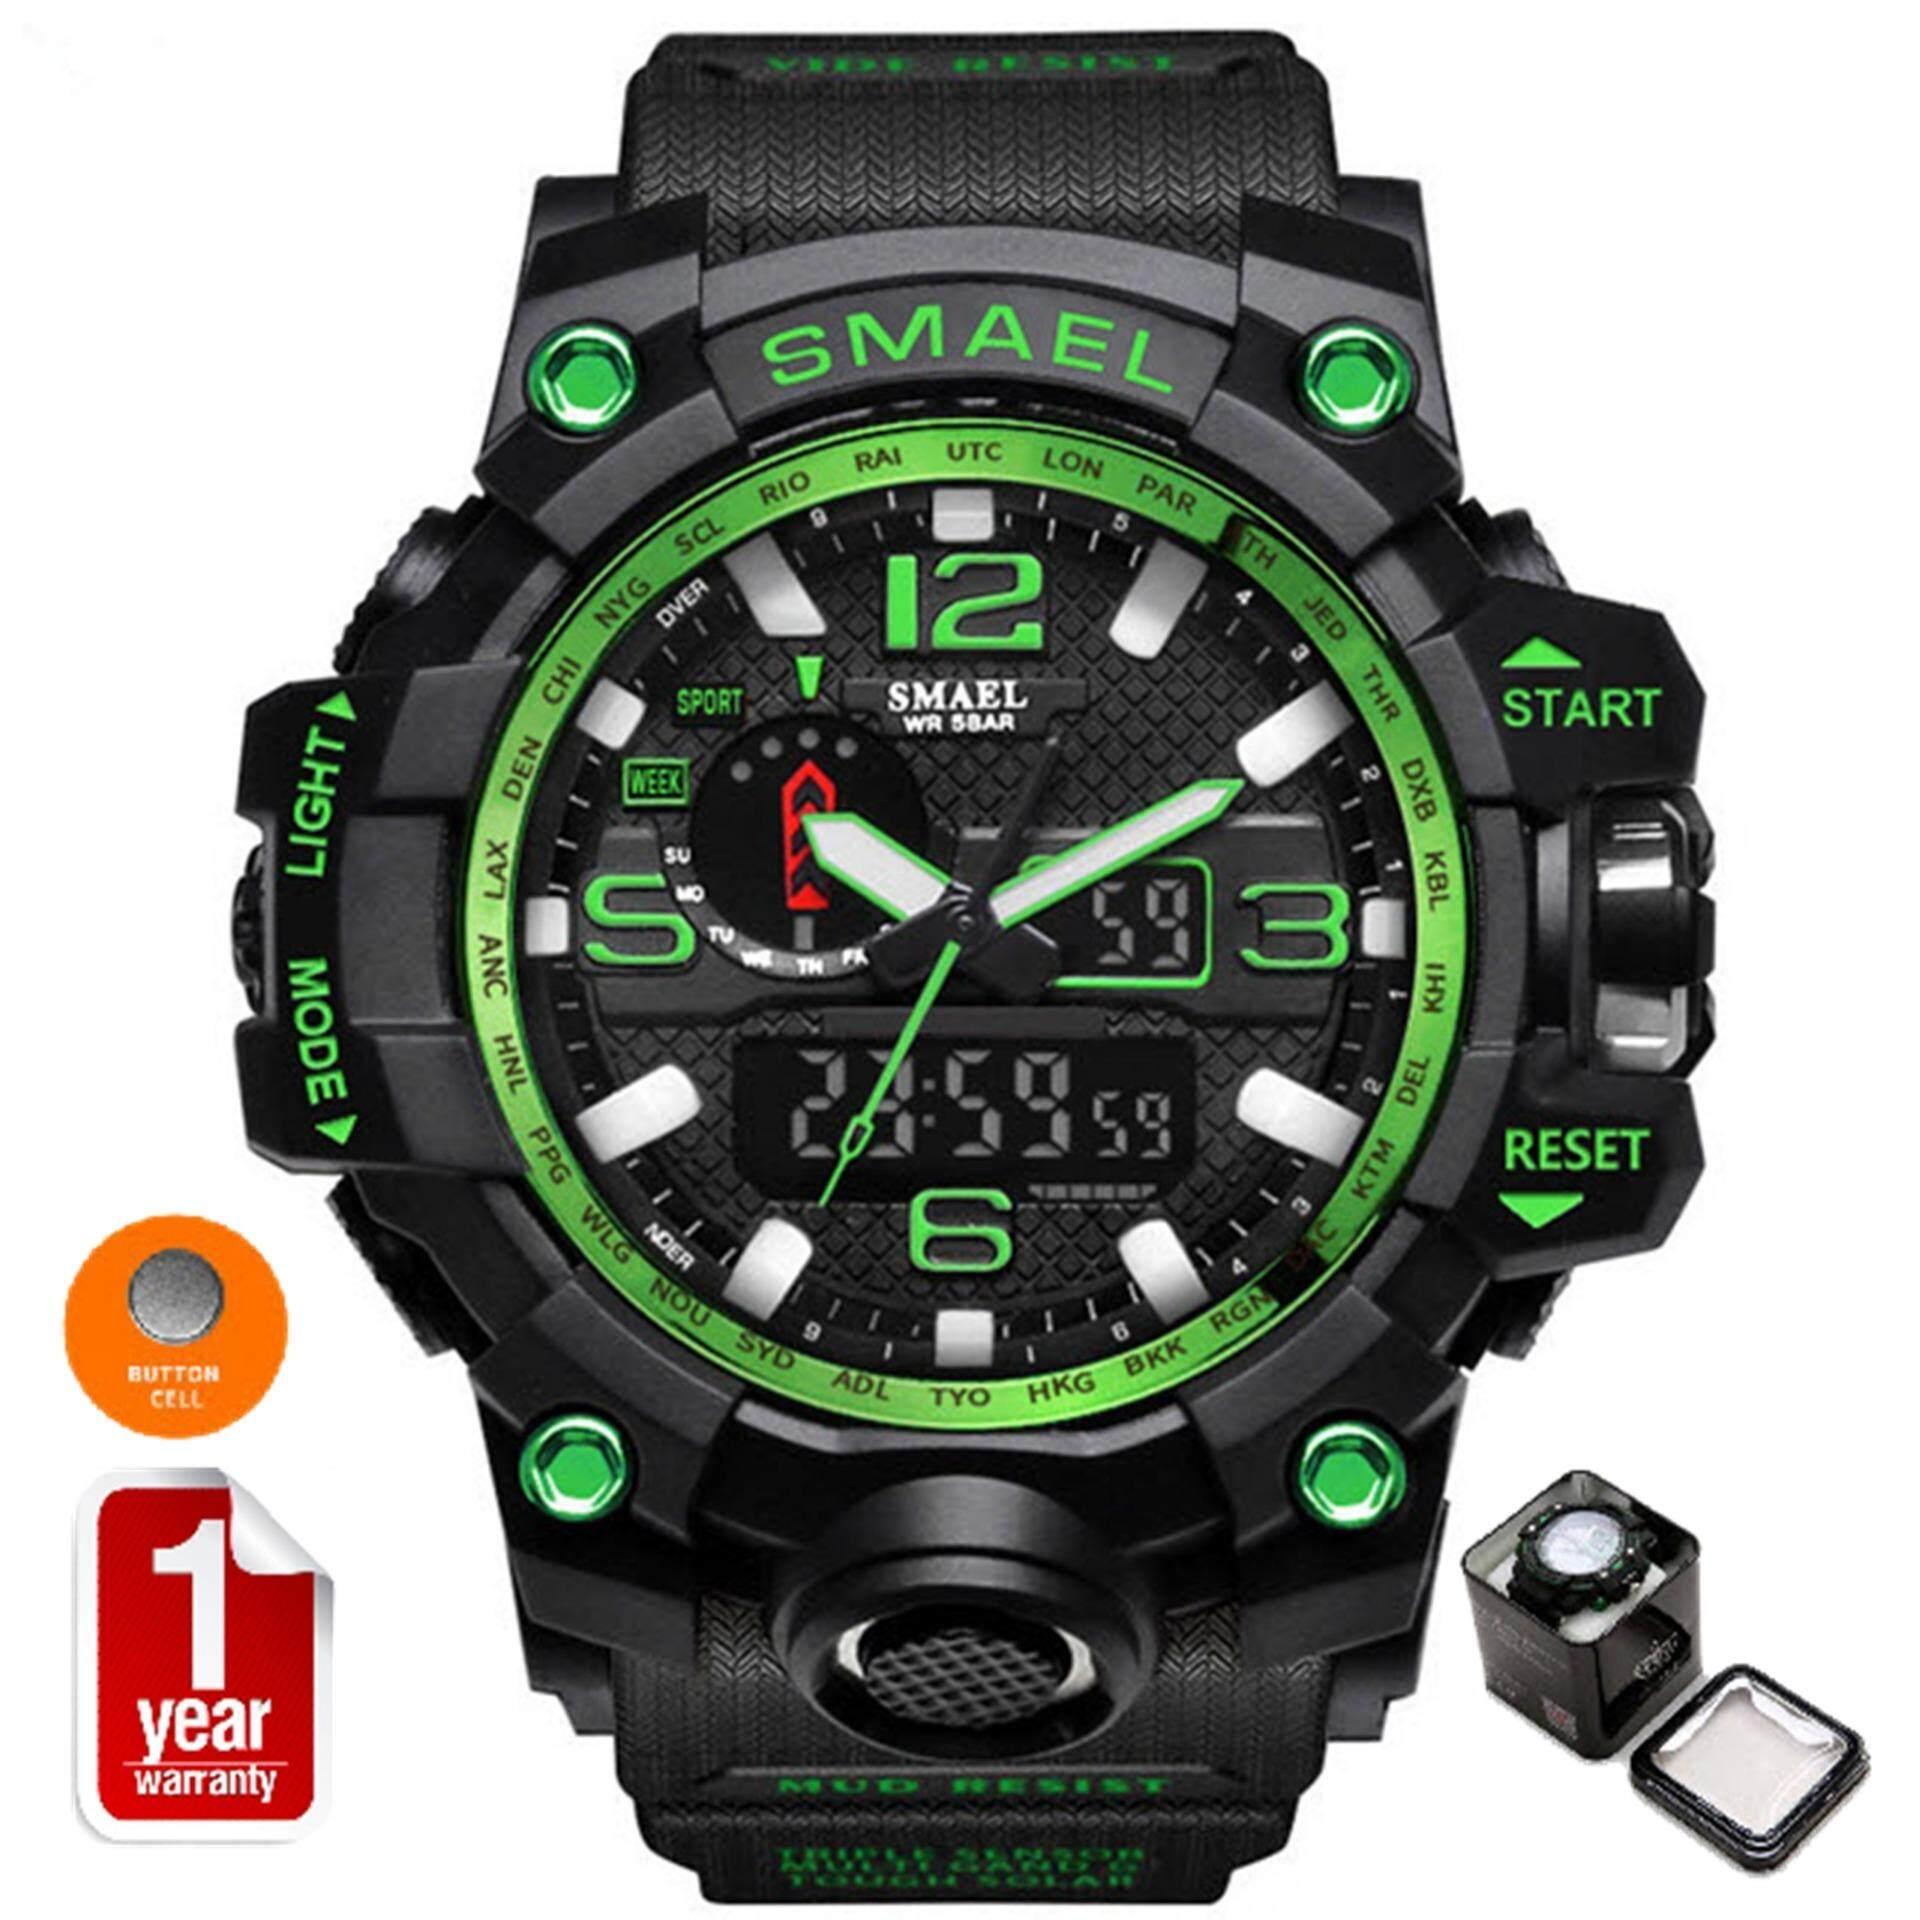 Smael นาฬิกาข้อมือผู้ชาย Sport Digital Led รุ่น Sm1545 Black Green สมุทรปราการ